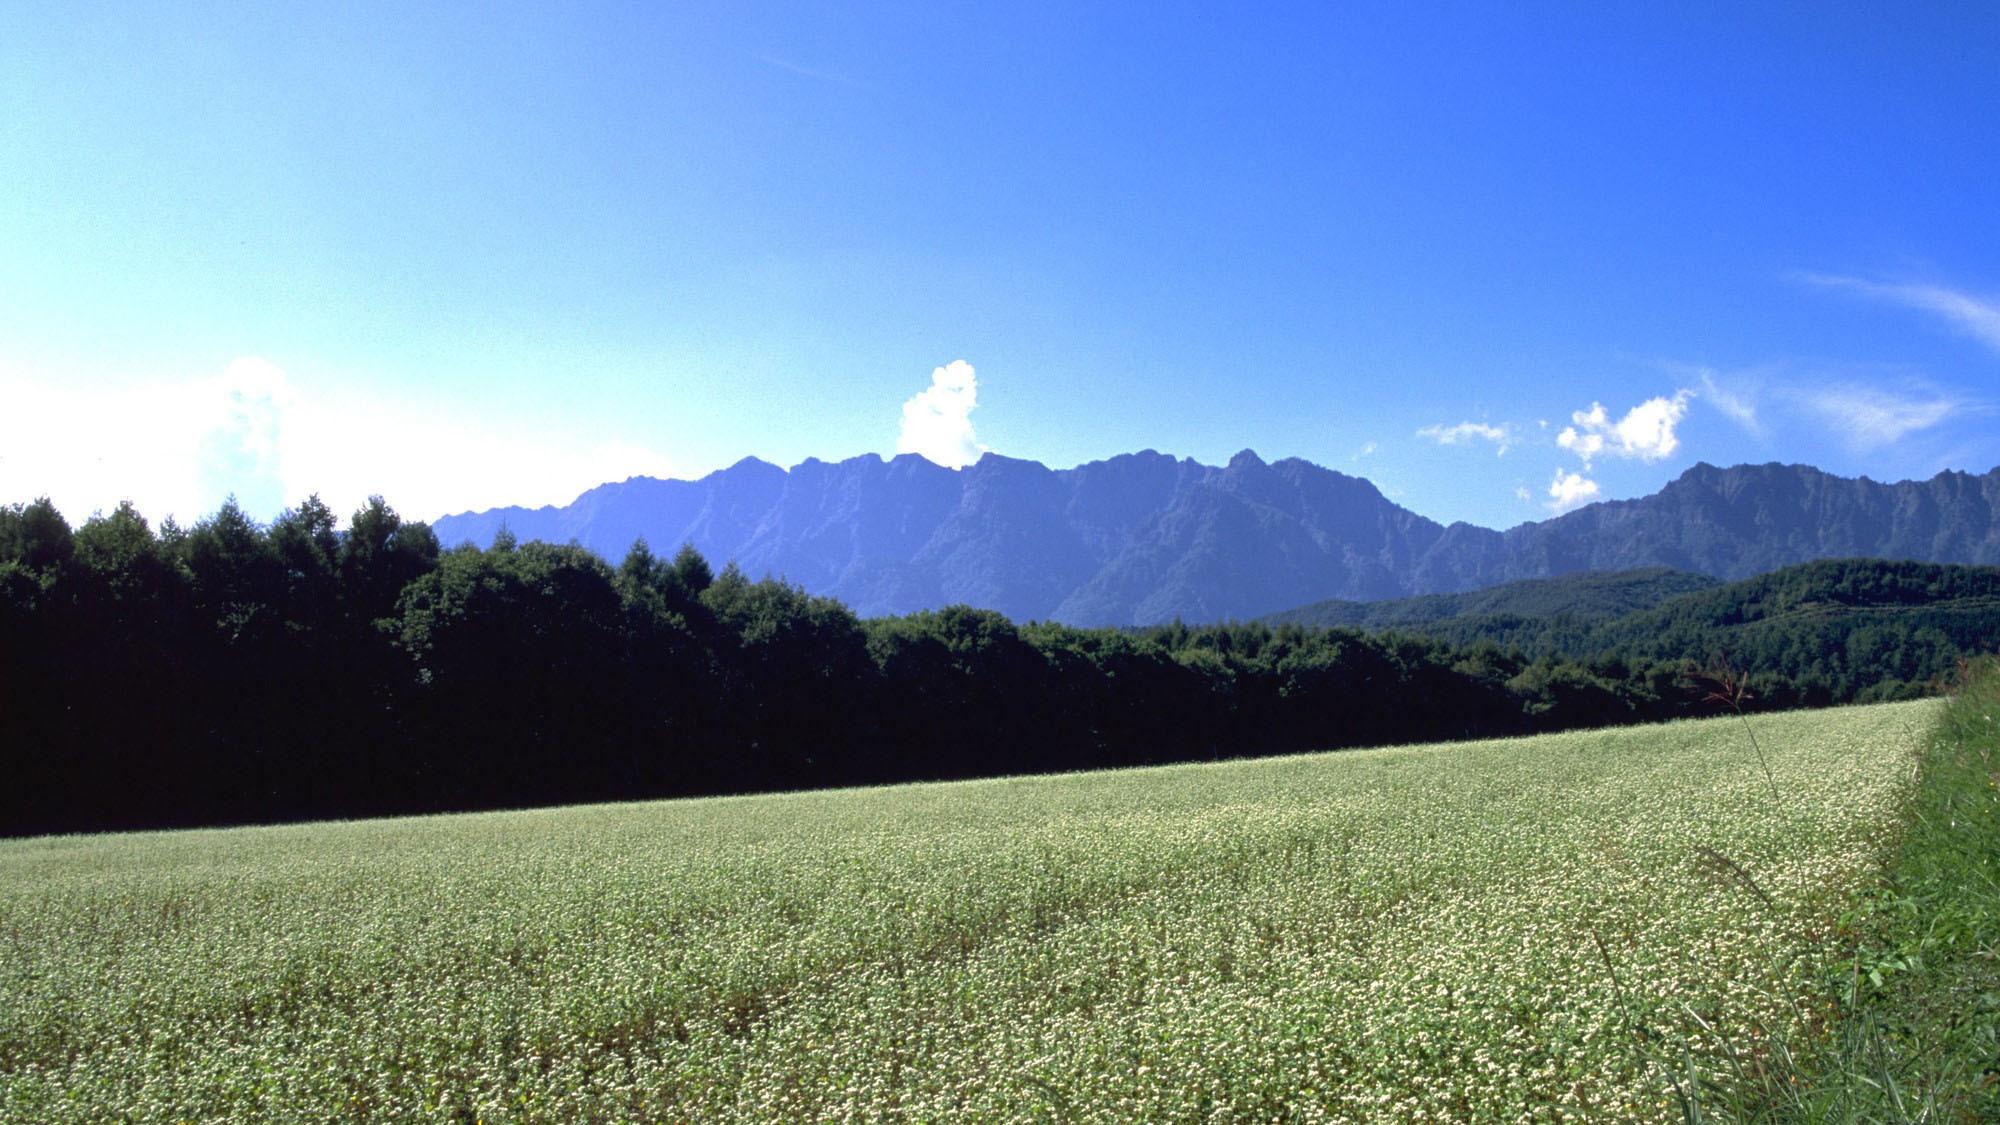 戸隠高原そば畑(写真提供:長野県観光機構)